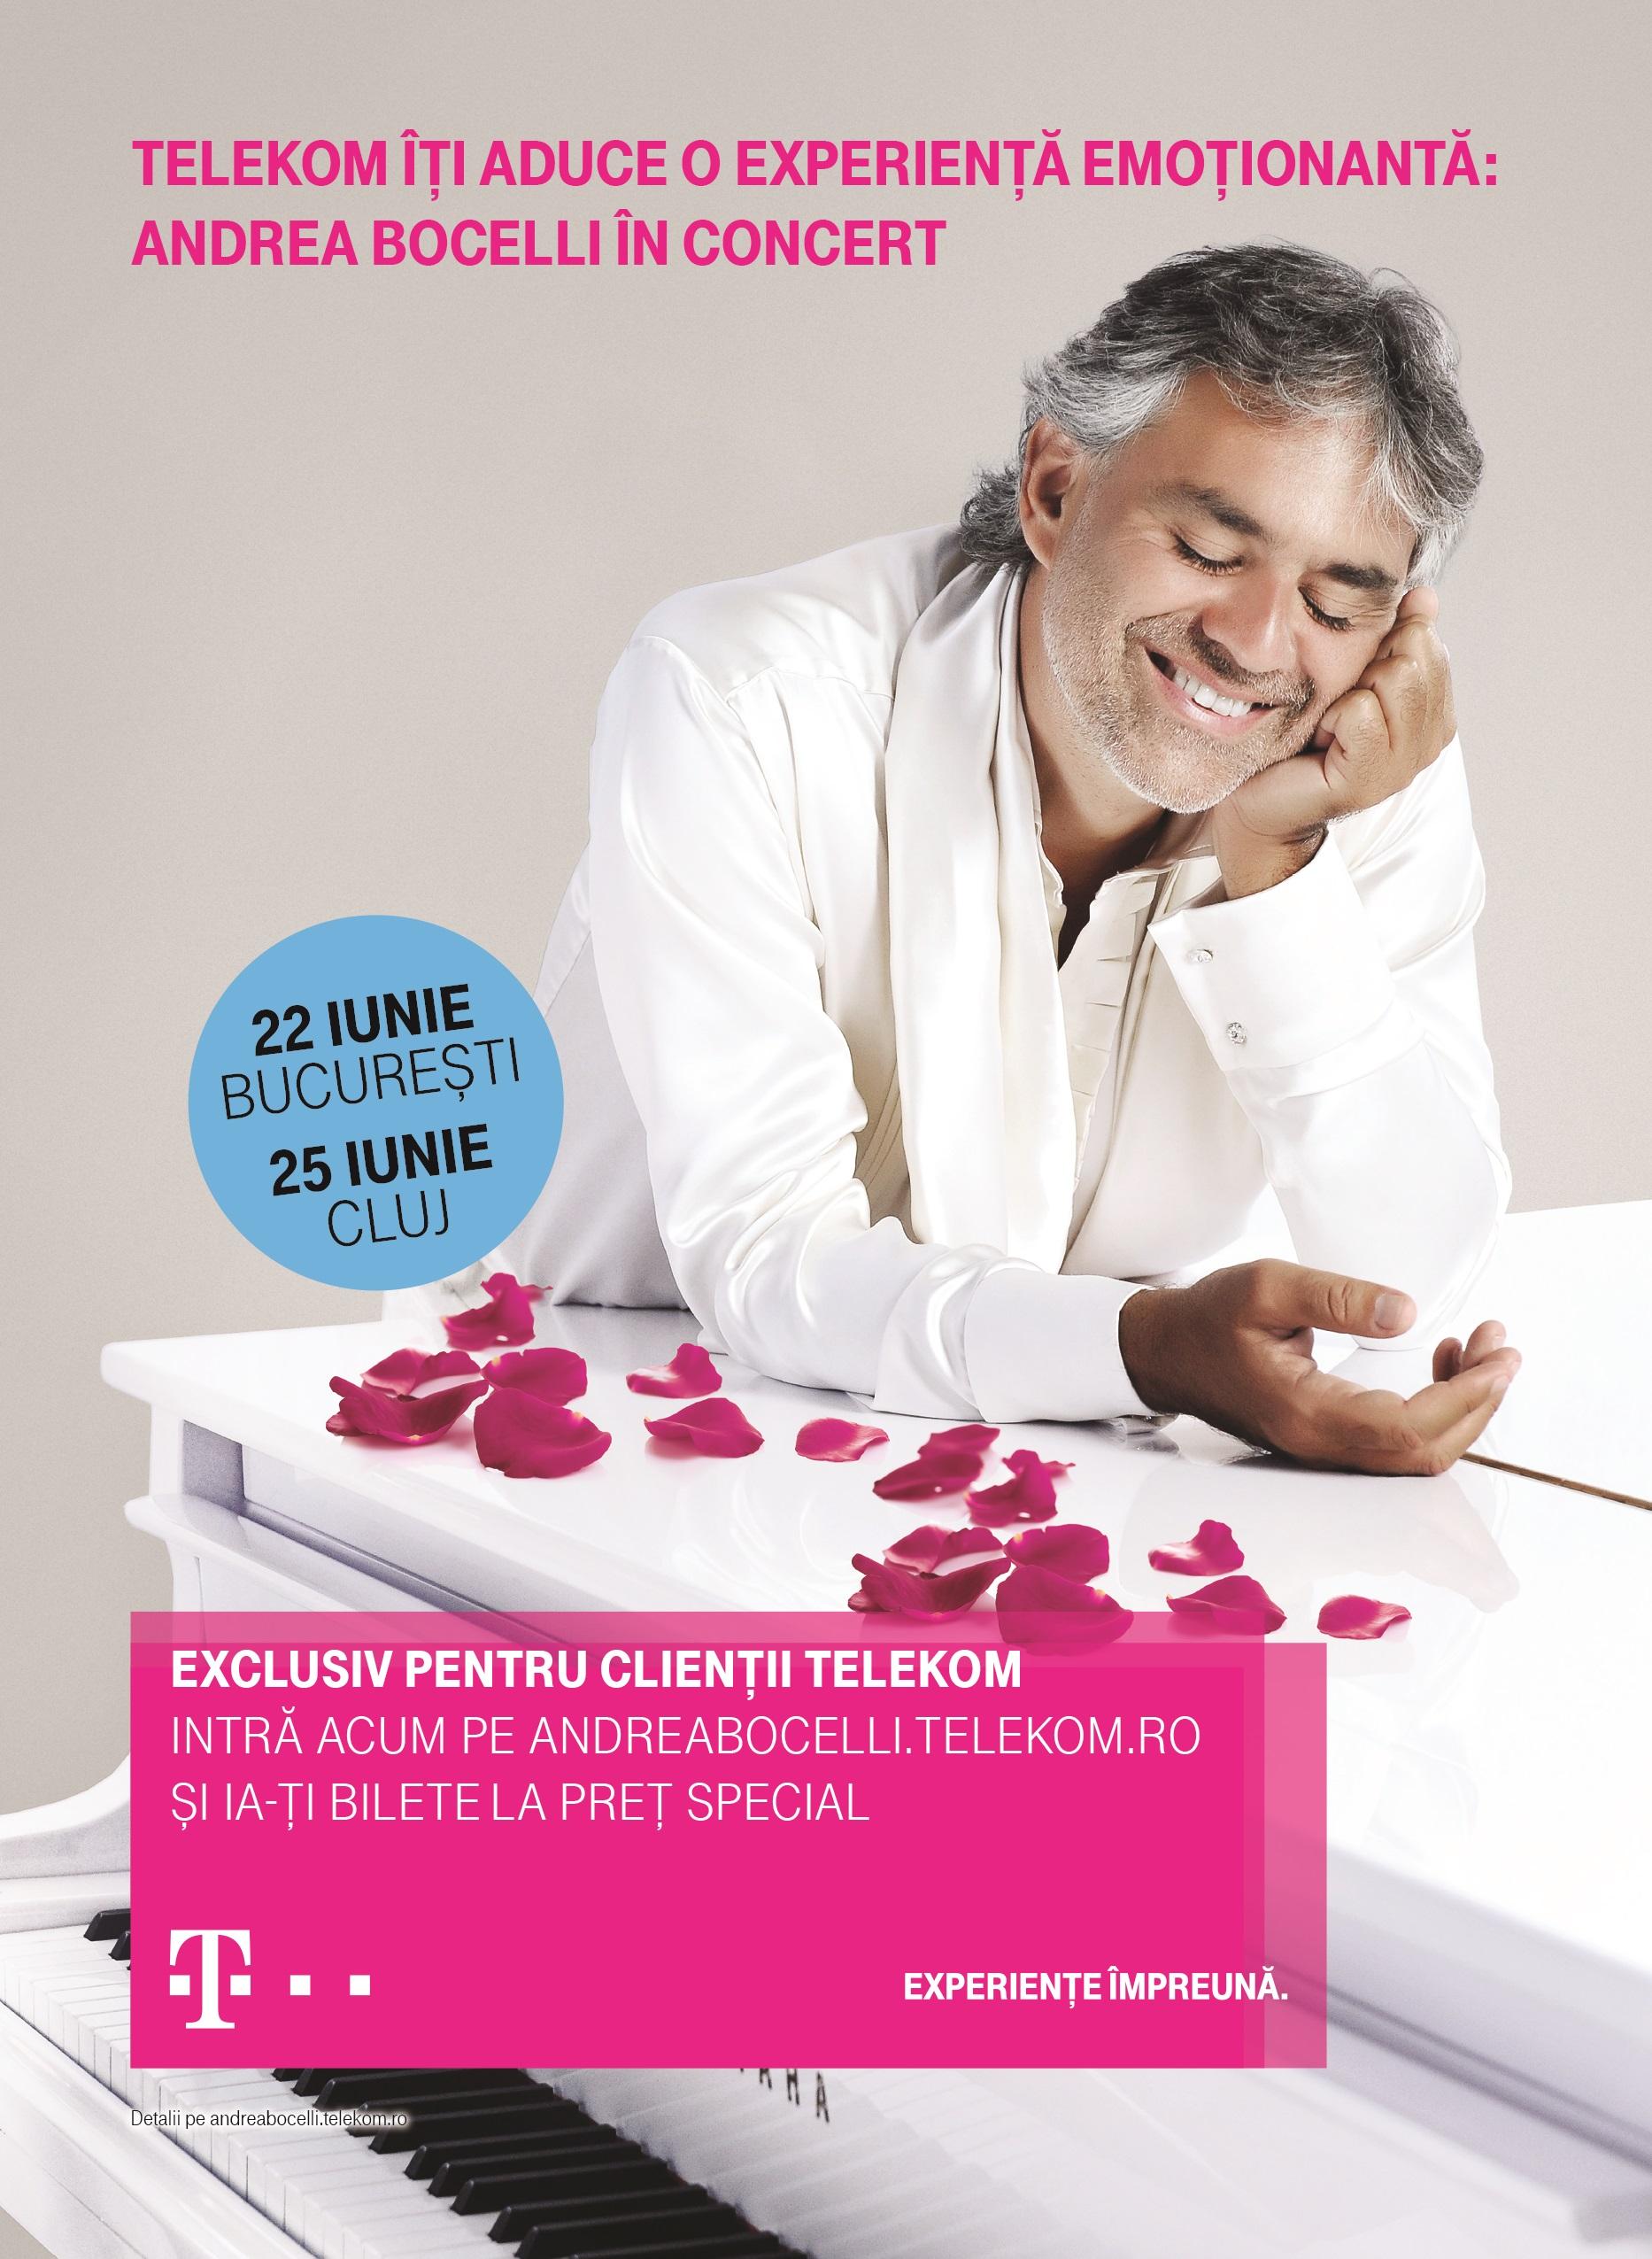 Telekom prezinta Andrea Bocelli World Tour 2017 in Romania